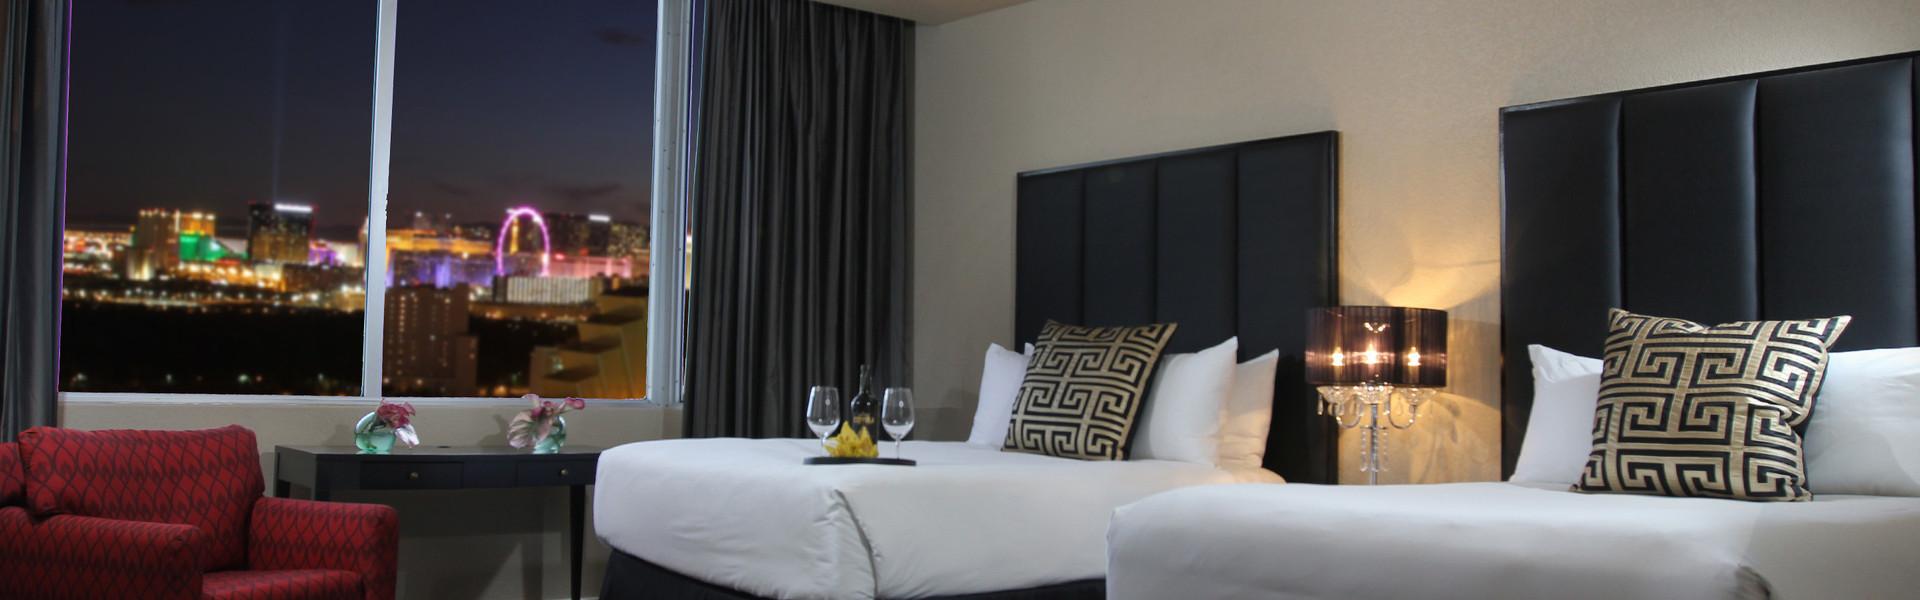 Las Vegas Hotel Rooms Interior   Westgate Las Vegas Resort & Casino   Westgate Resorts